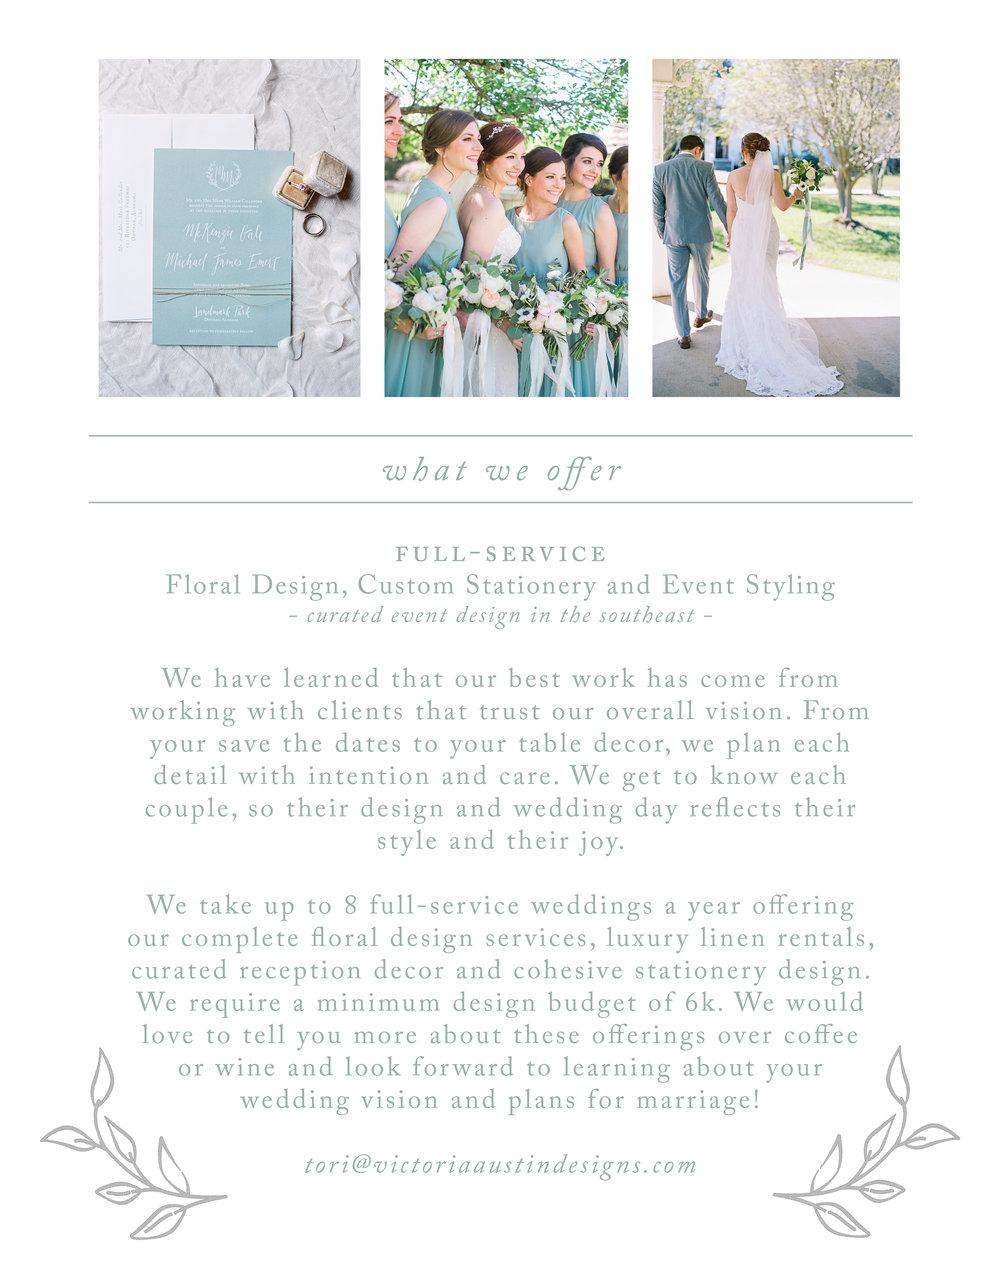 Victoria Austin Designs | 2017 Weddings | Alabama Weddings | Design, Florals, Stationery, Planning